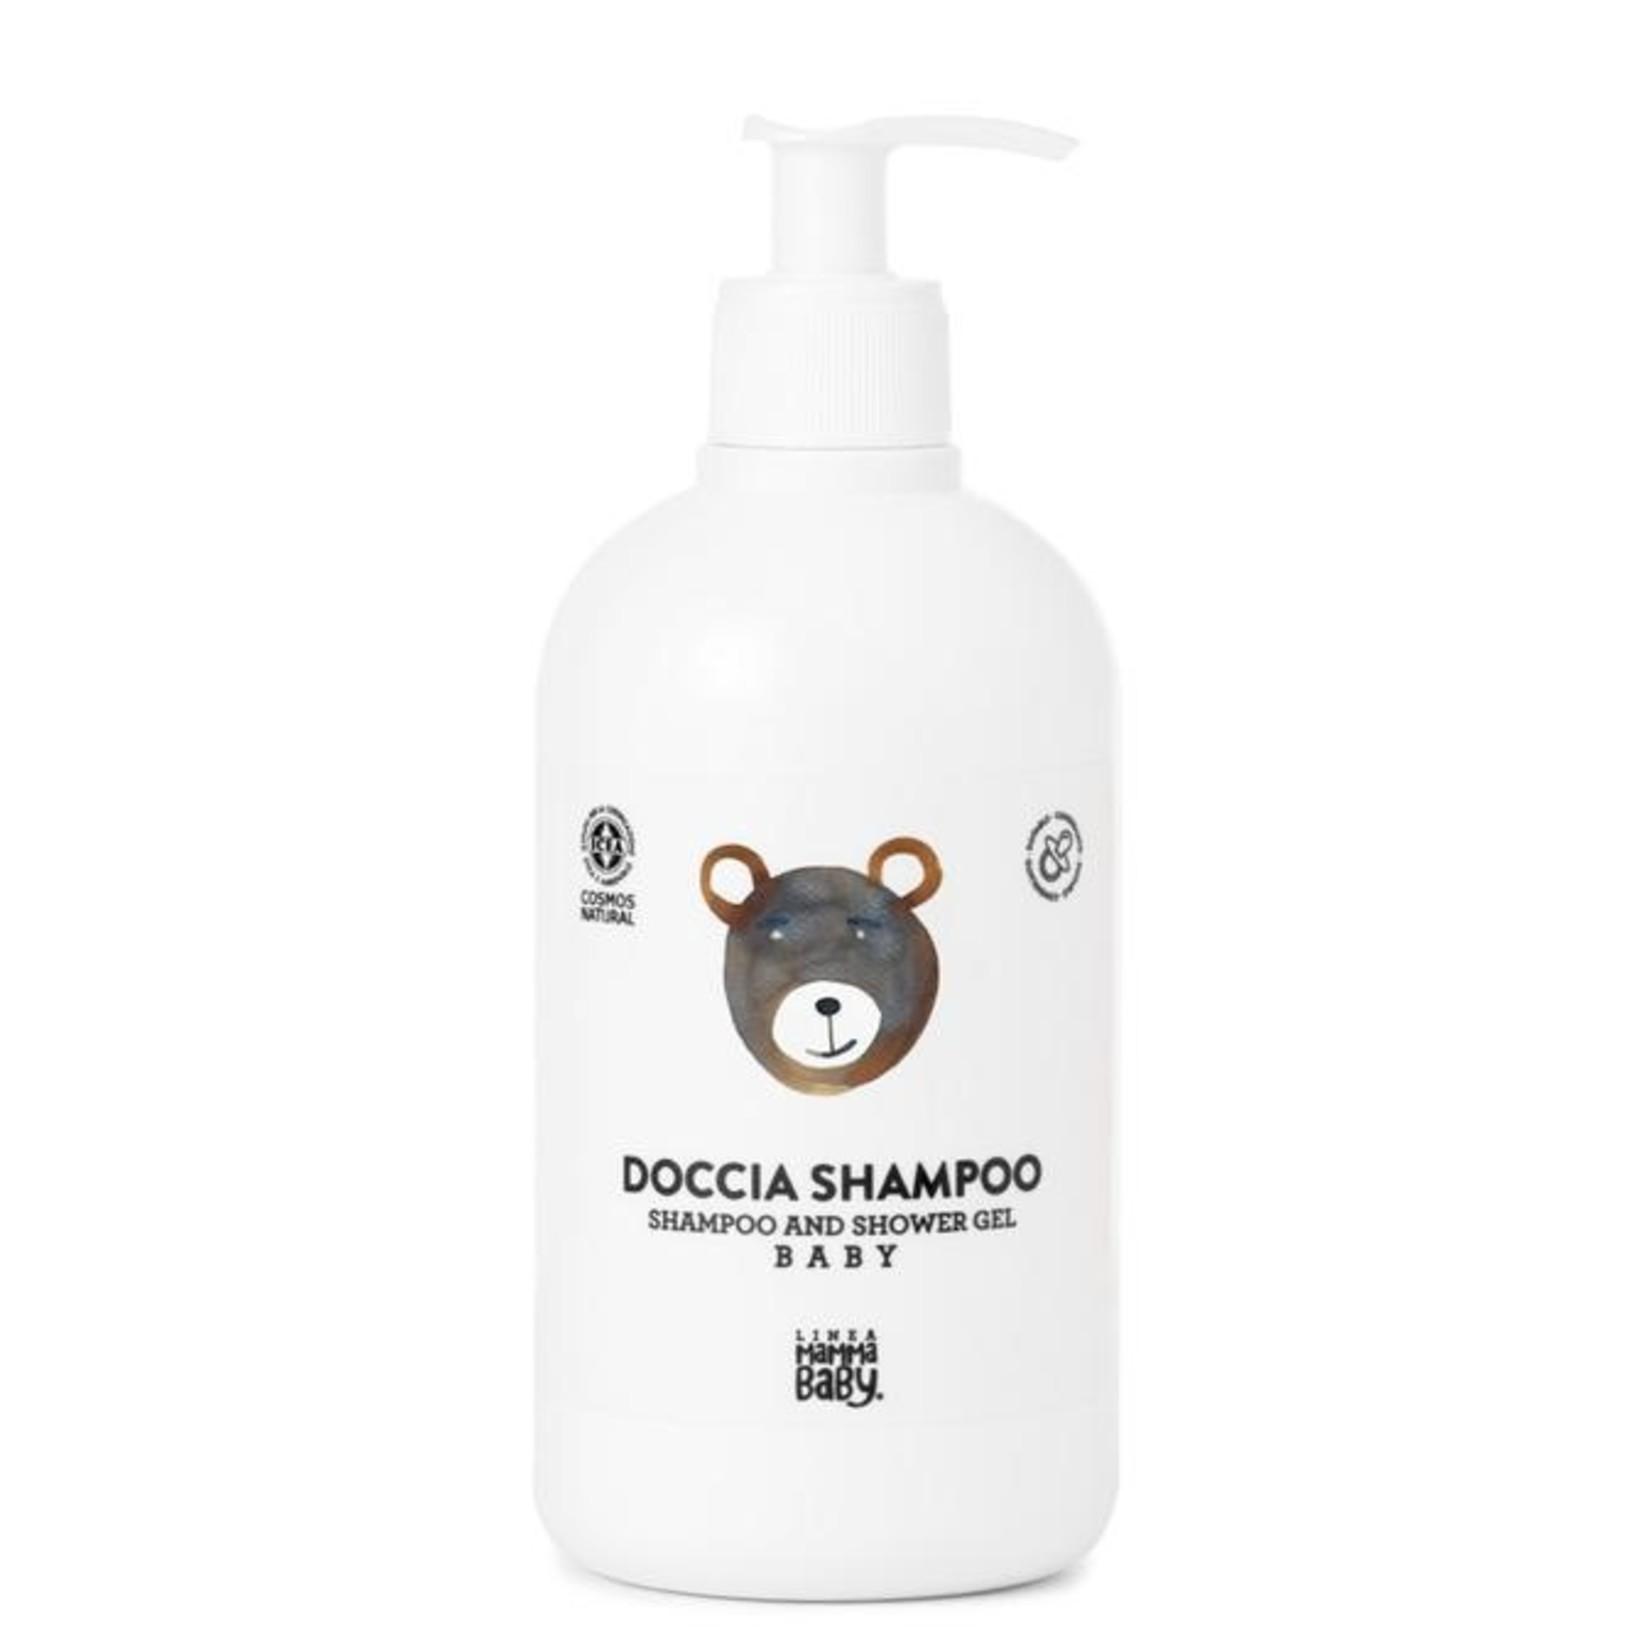 Linea Mamma Baby Linea Mamma Baby Shampoo & Shower gel Cosmos 500ml